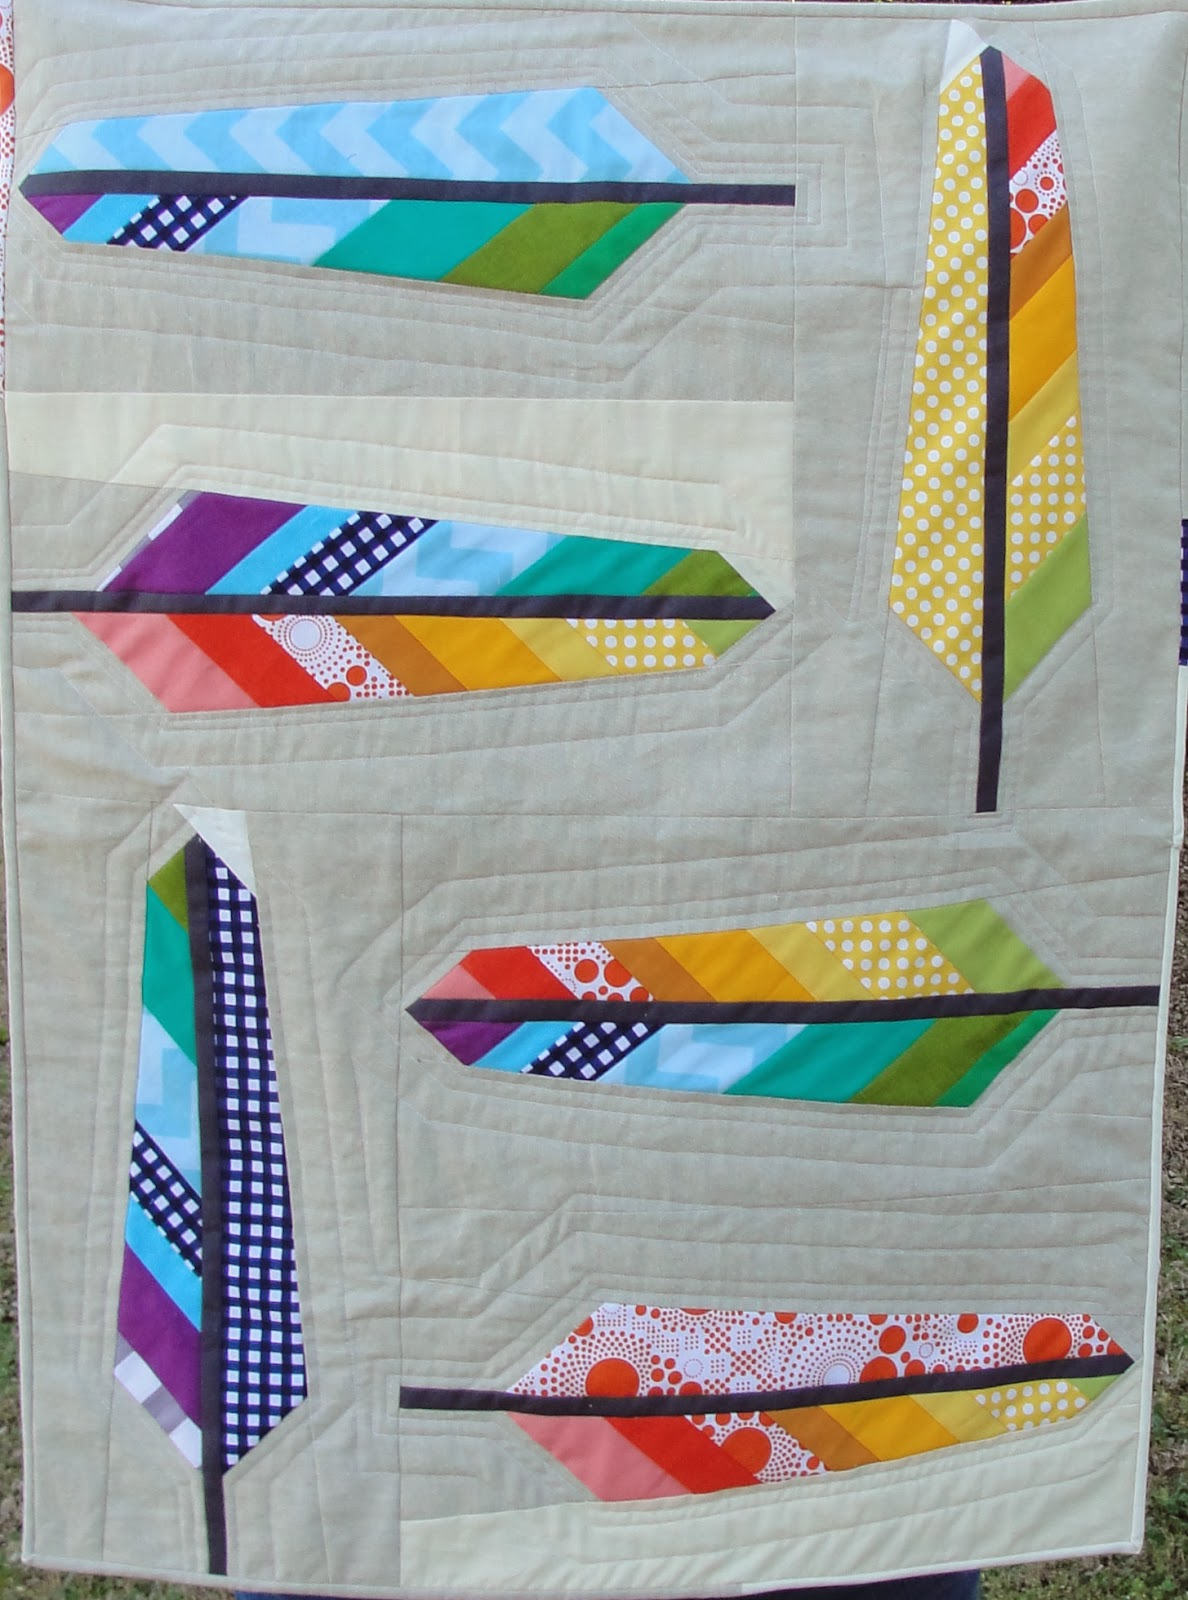 Stitchy Quilt Stuff: Riley Blake Feather Quilt : anna maria horner feather quilt - Adamdwight.com